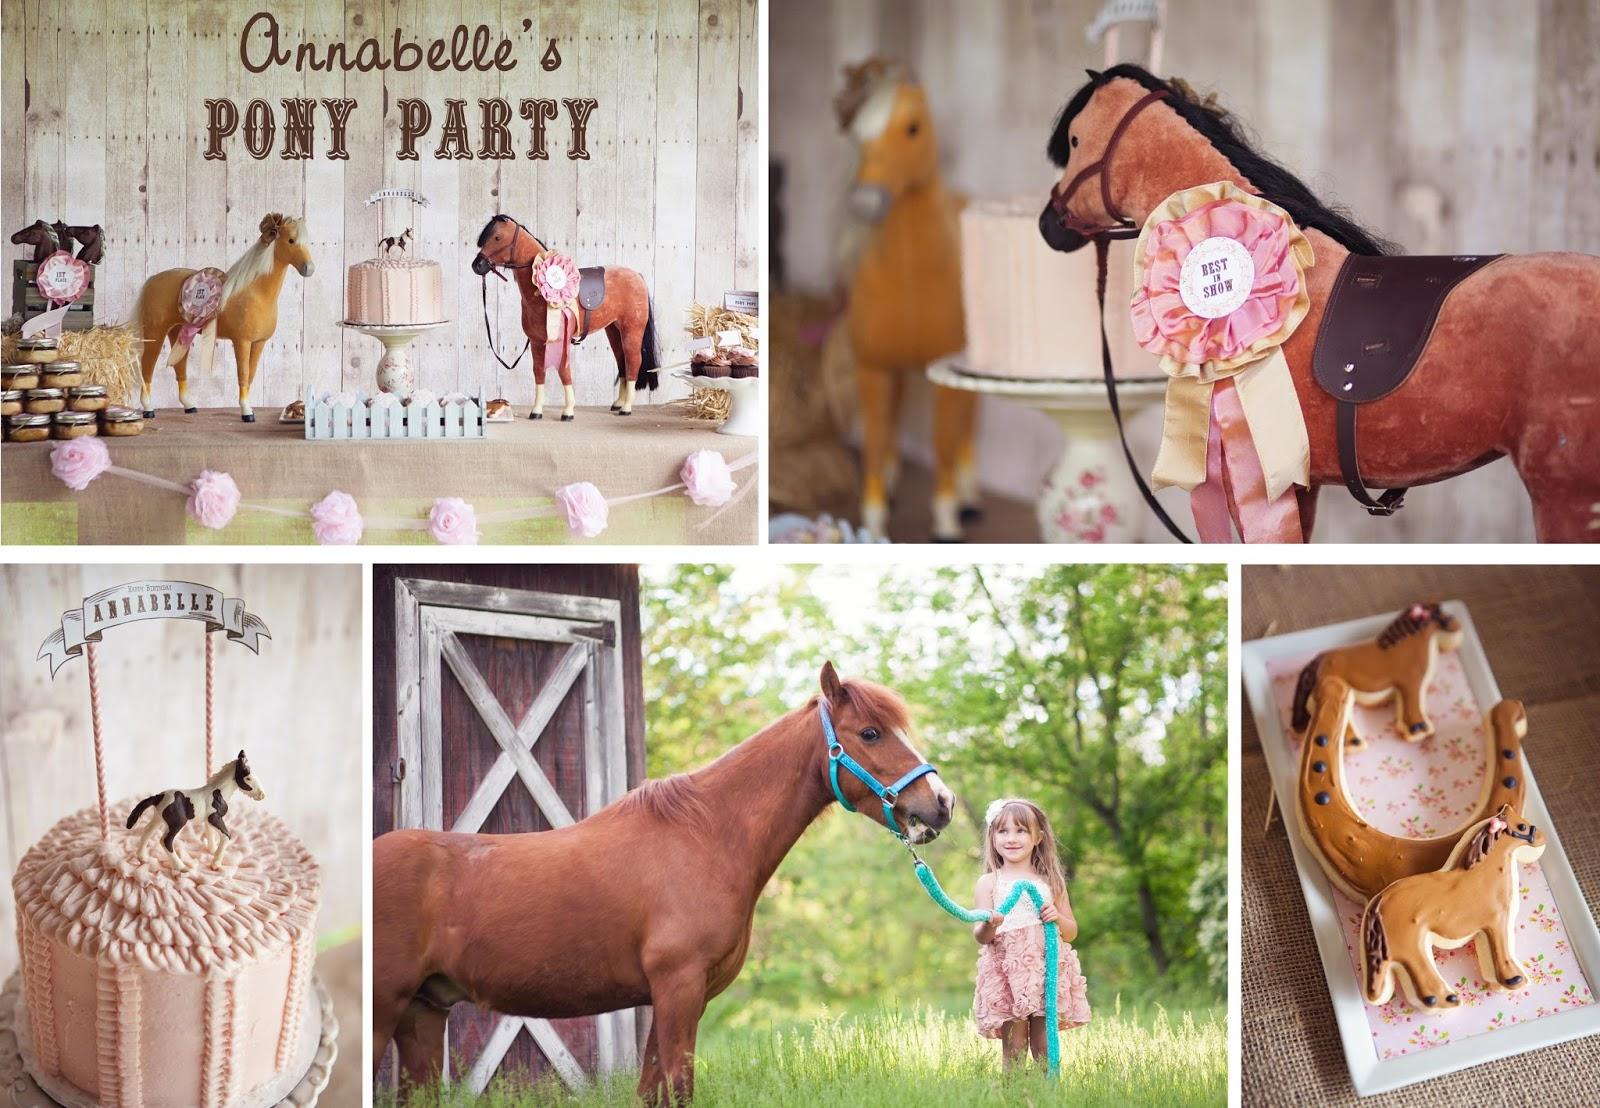 Horses Toys For Girls Birthdays : The homespun hostess pony party celebrating annabelle s